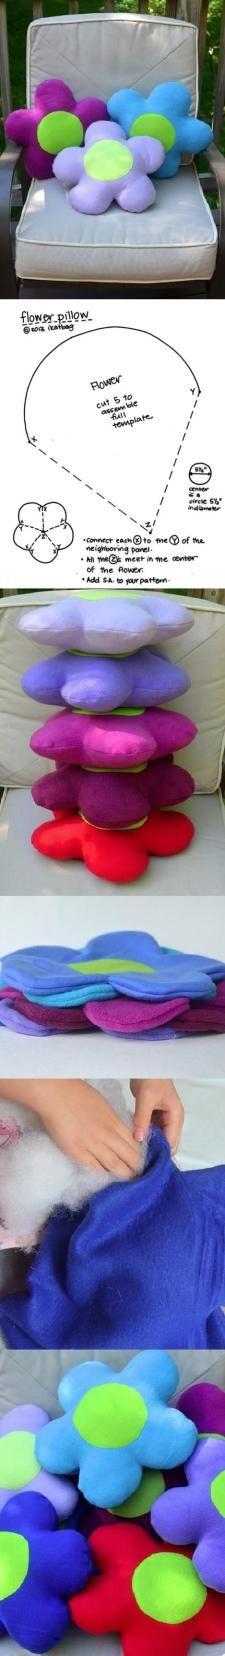 cushion related articles - Pandahall.com